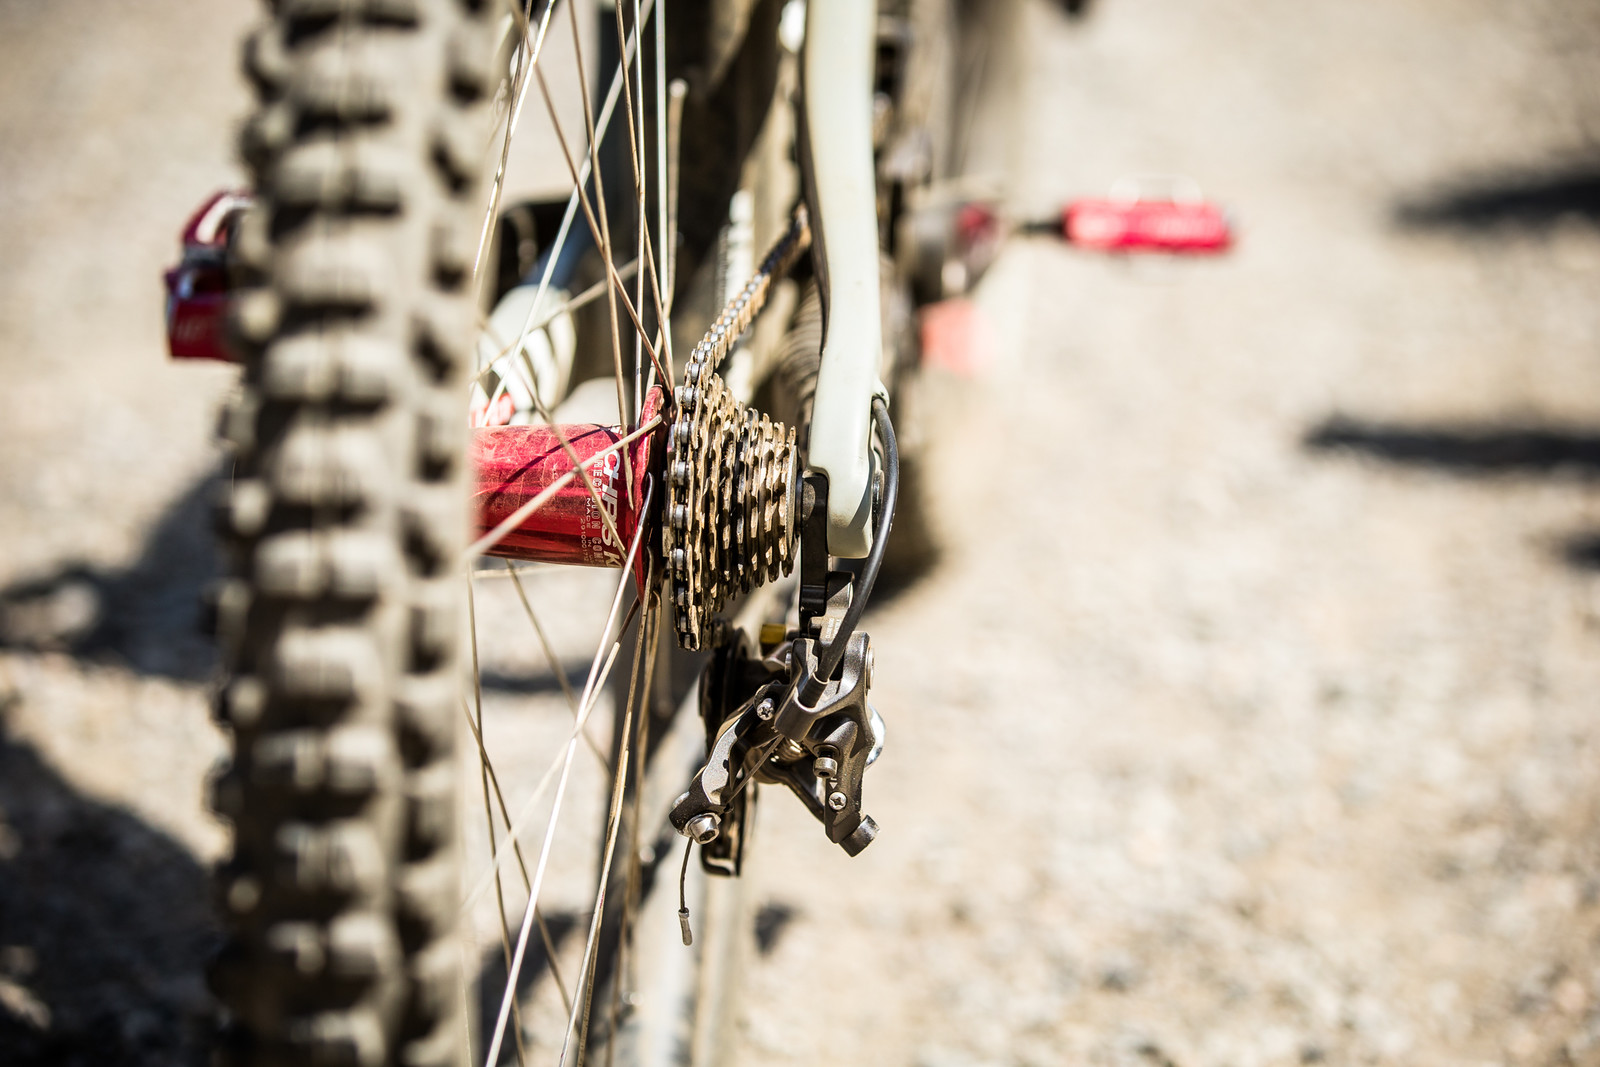 Chris King Hubs, Shimano Saint Drivetrain - WINNING BIKE - Loris Vergier's Santa Cruz V10cc 29 - Mountain Biking Pictures - Vital MTB